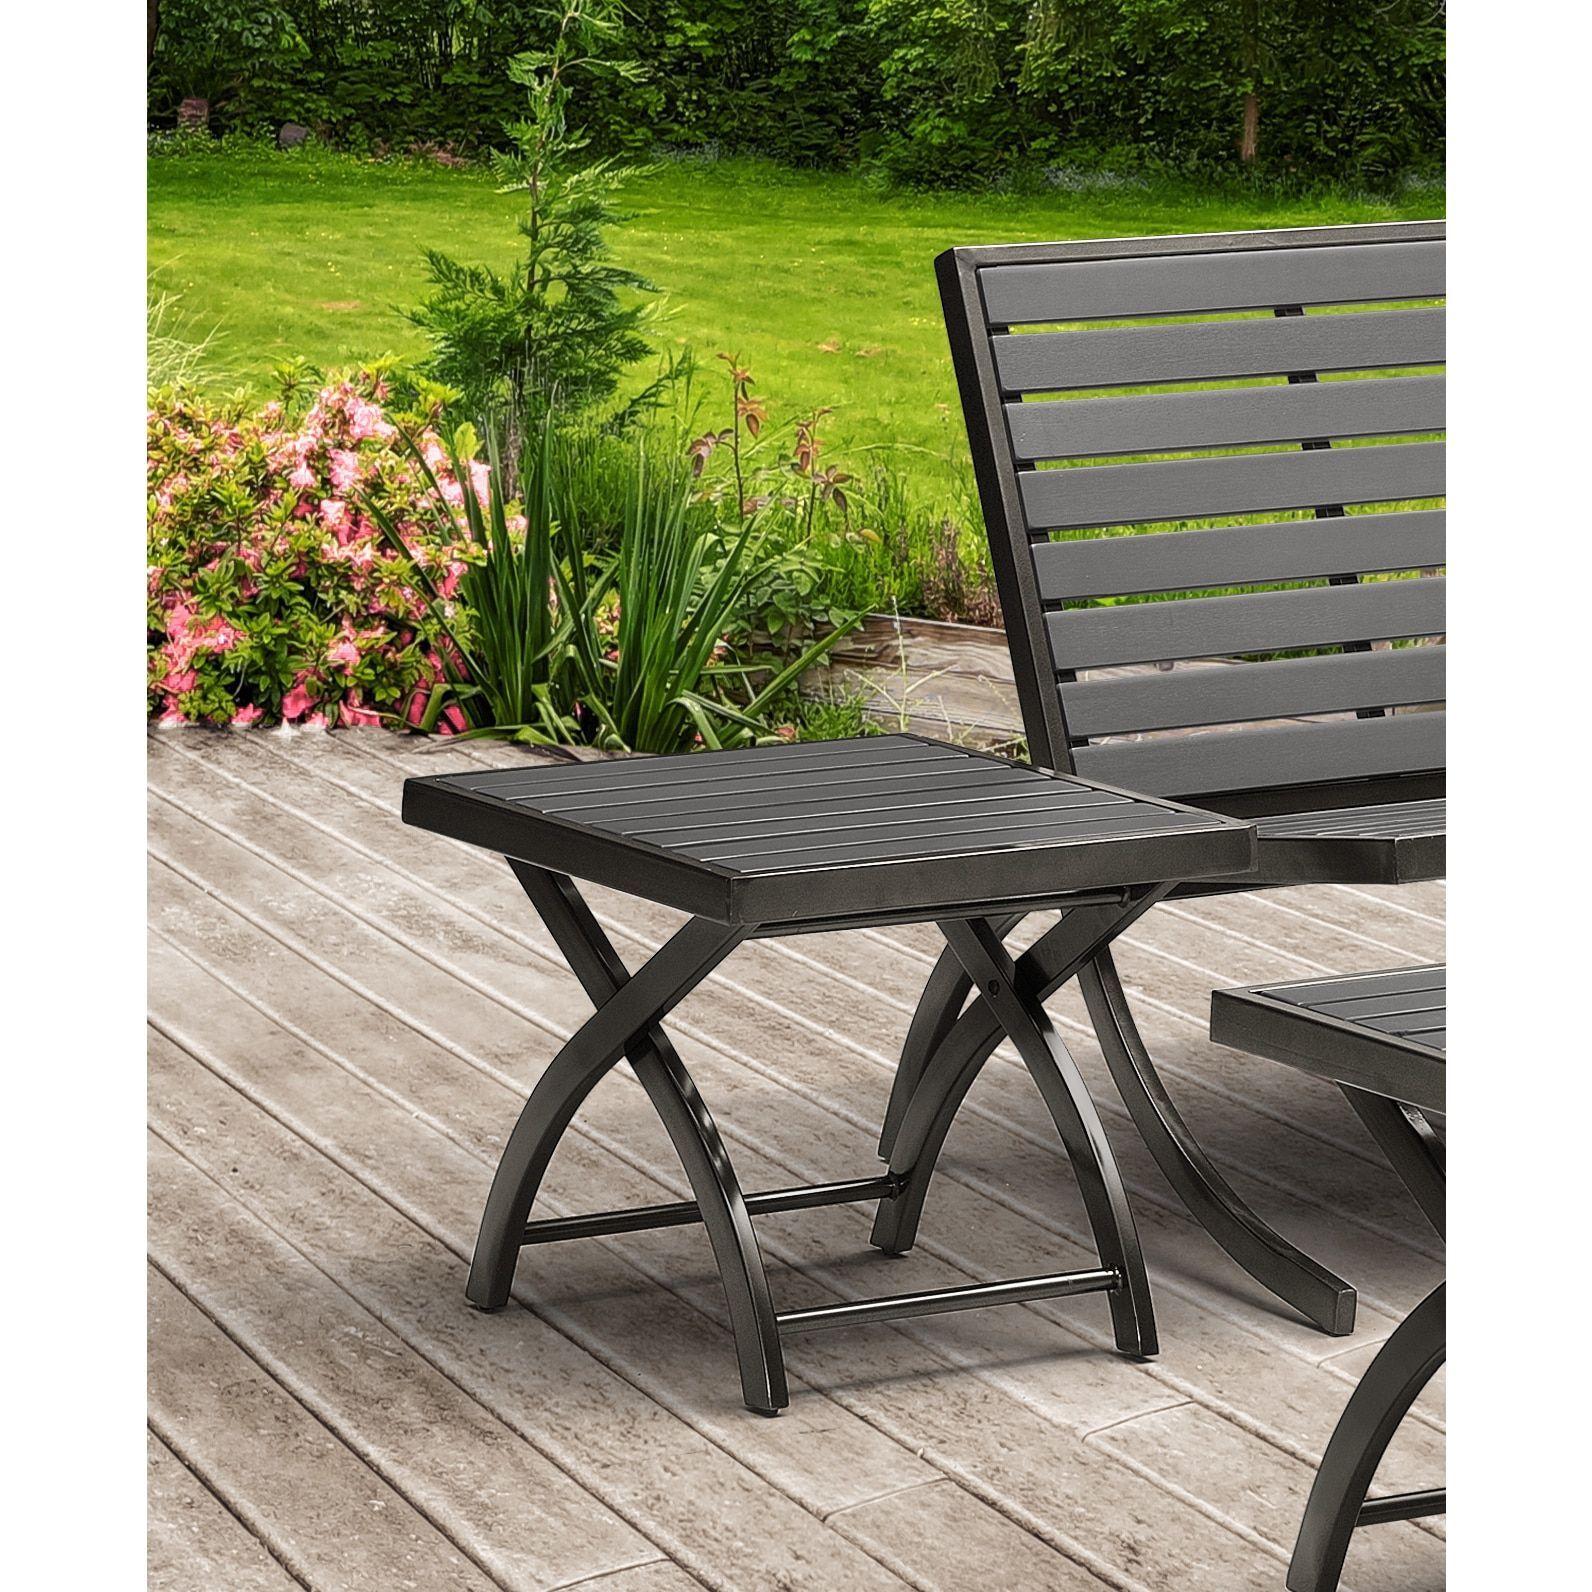 Peachy Rialto Side Table Charcoal Grey Patio Furniture Metal Machost Co Dining Chair Design Ideas Machostcouk